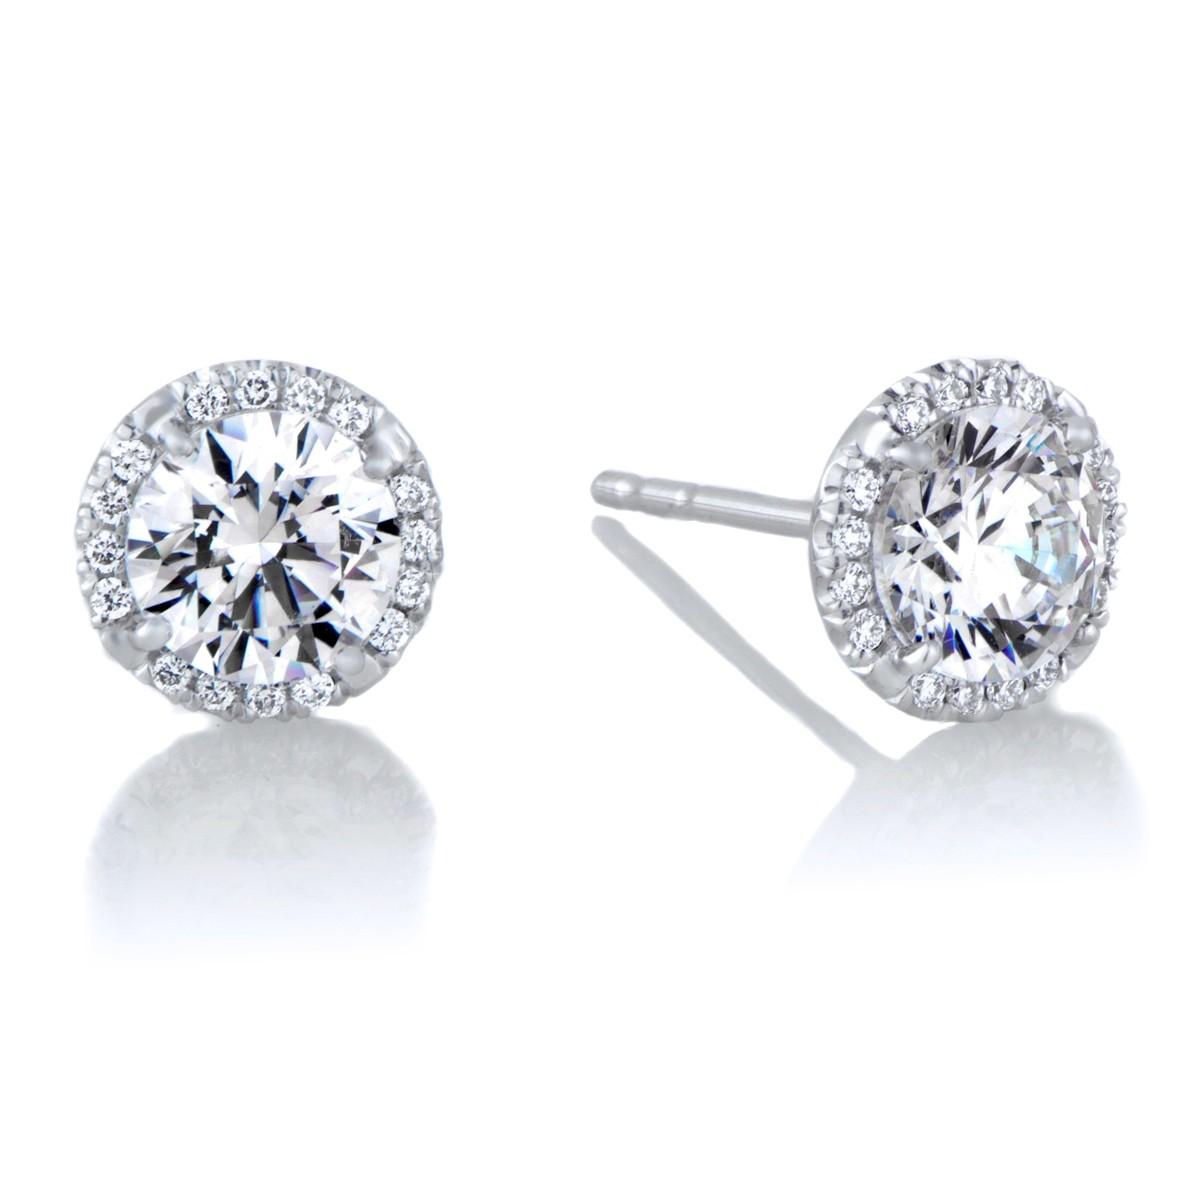 14k White Gold Diamond Halo Stud Earrings